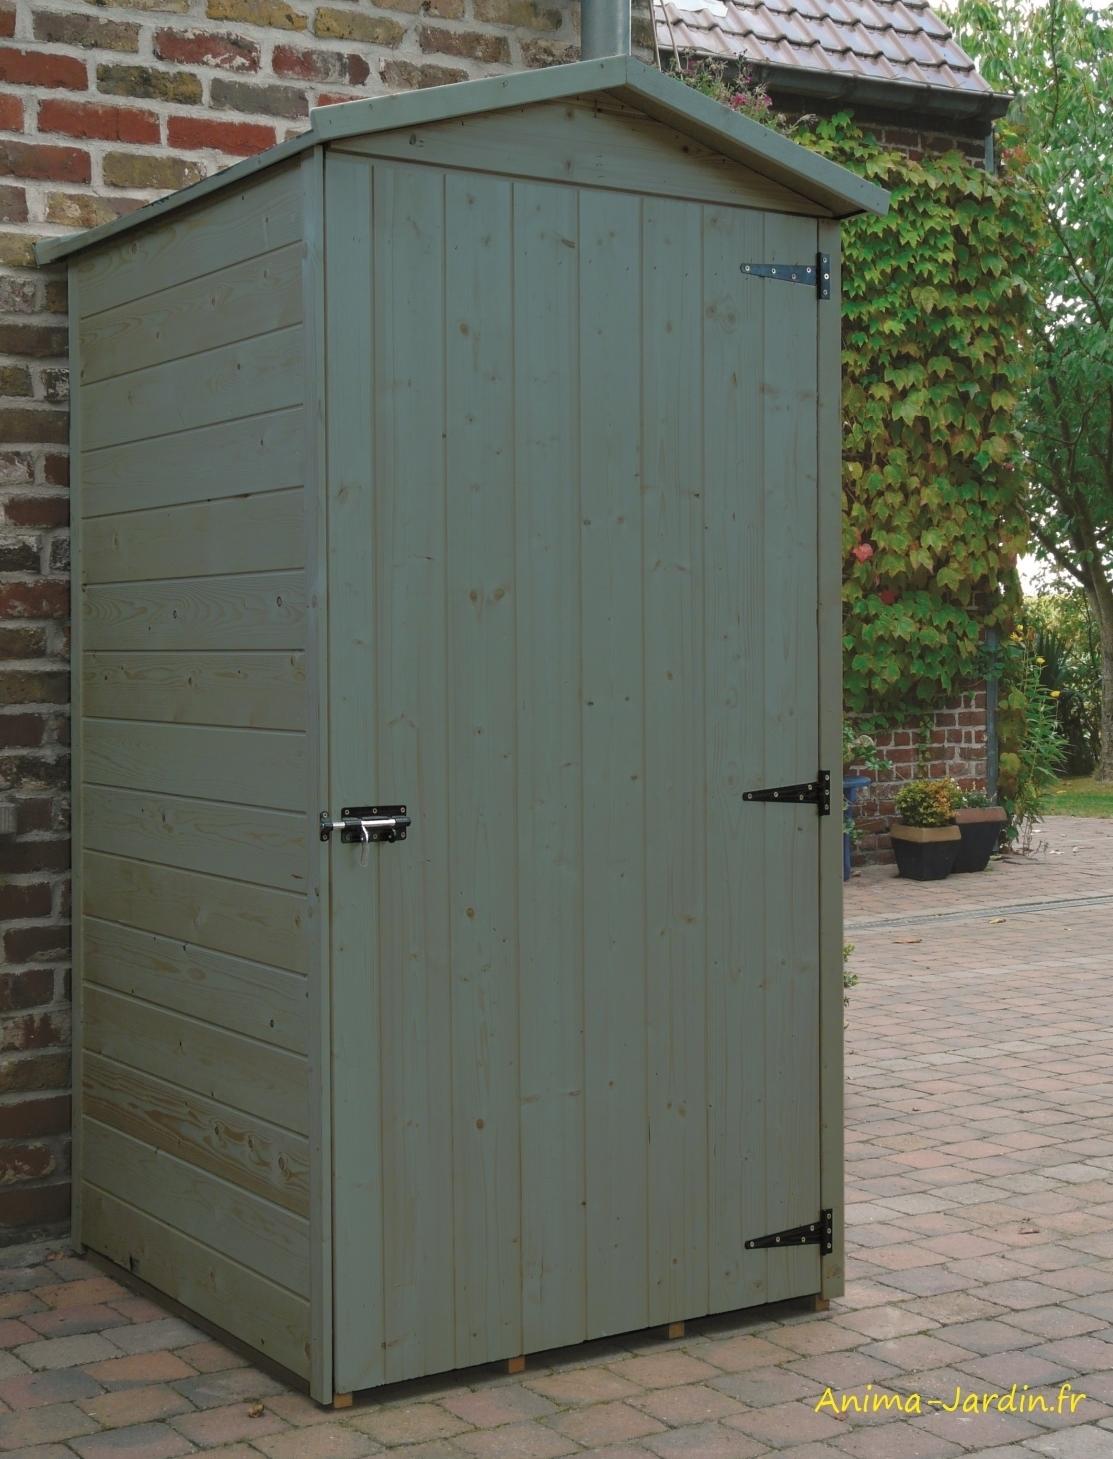 Armoire-storage-solid-bois-anima-jardin.fr